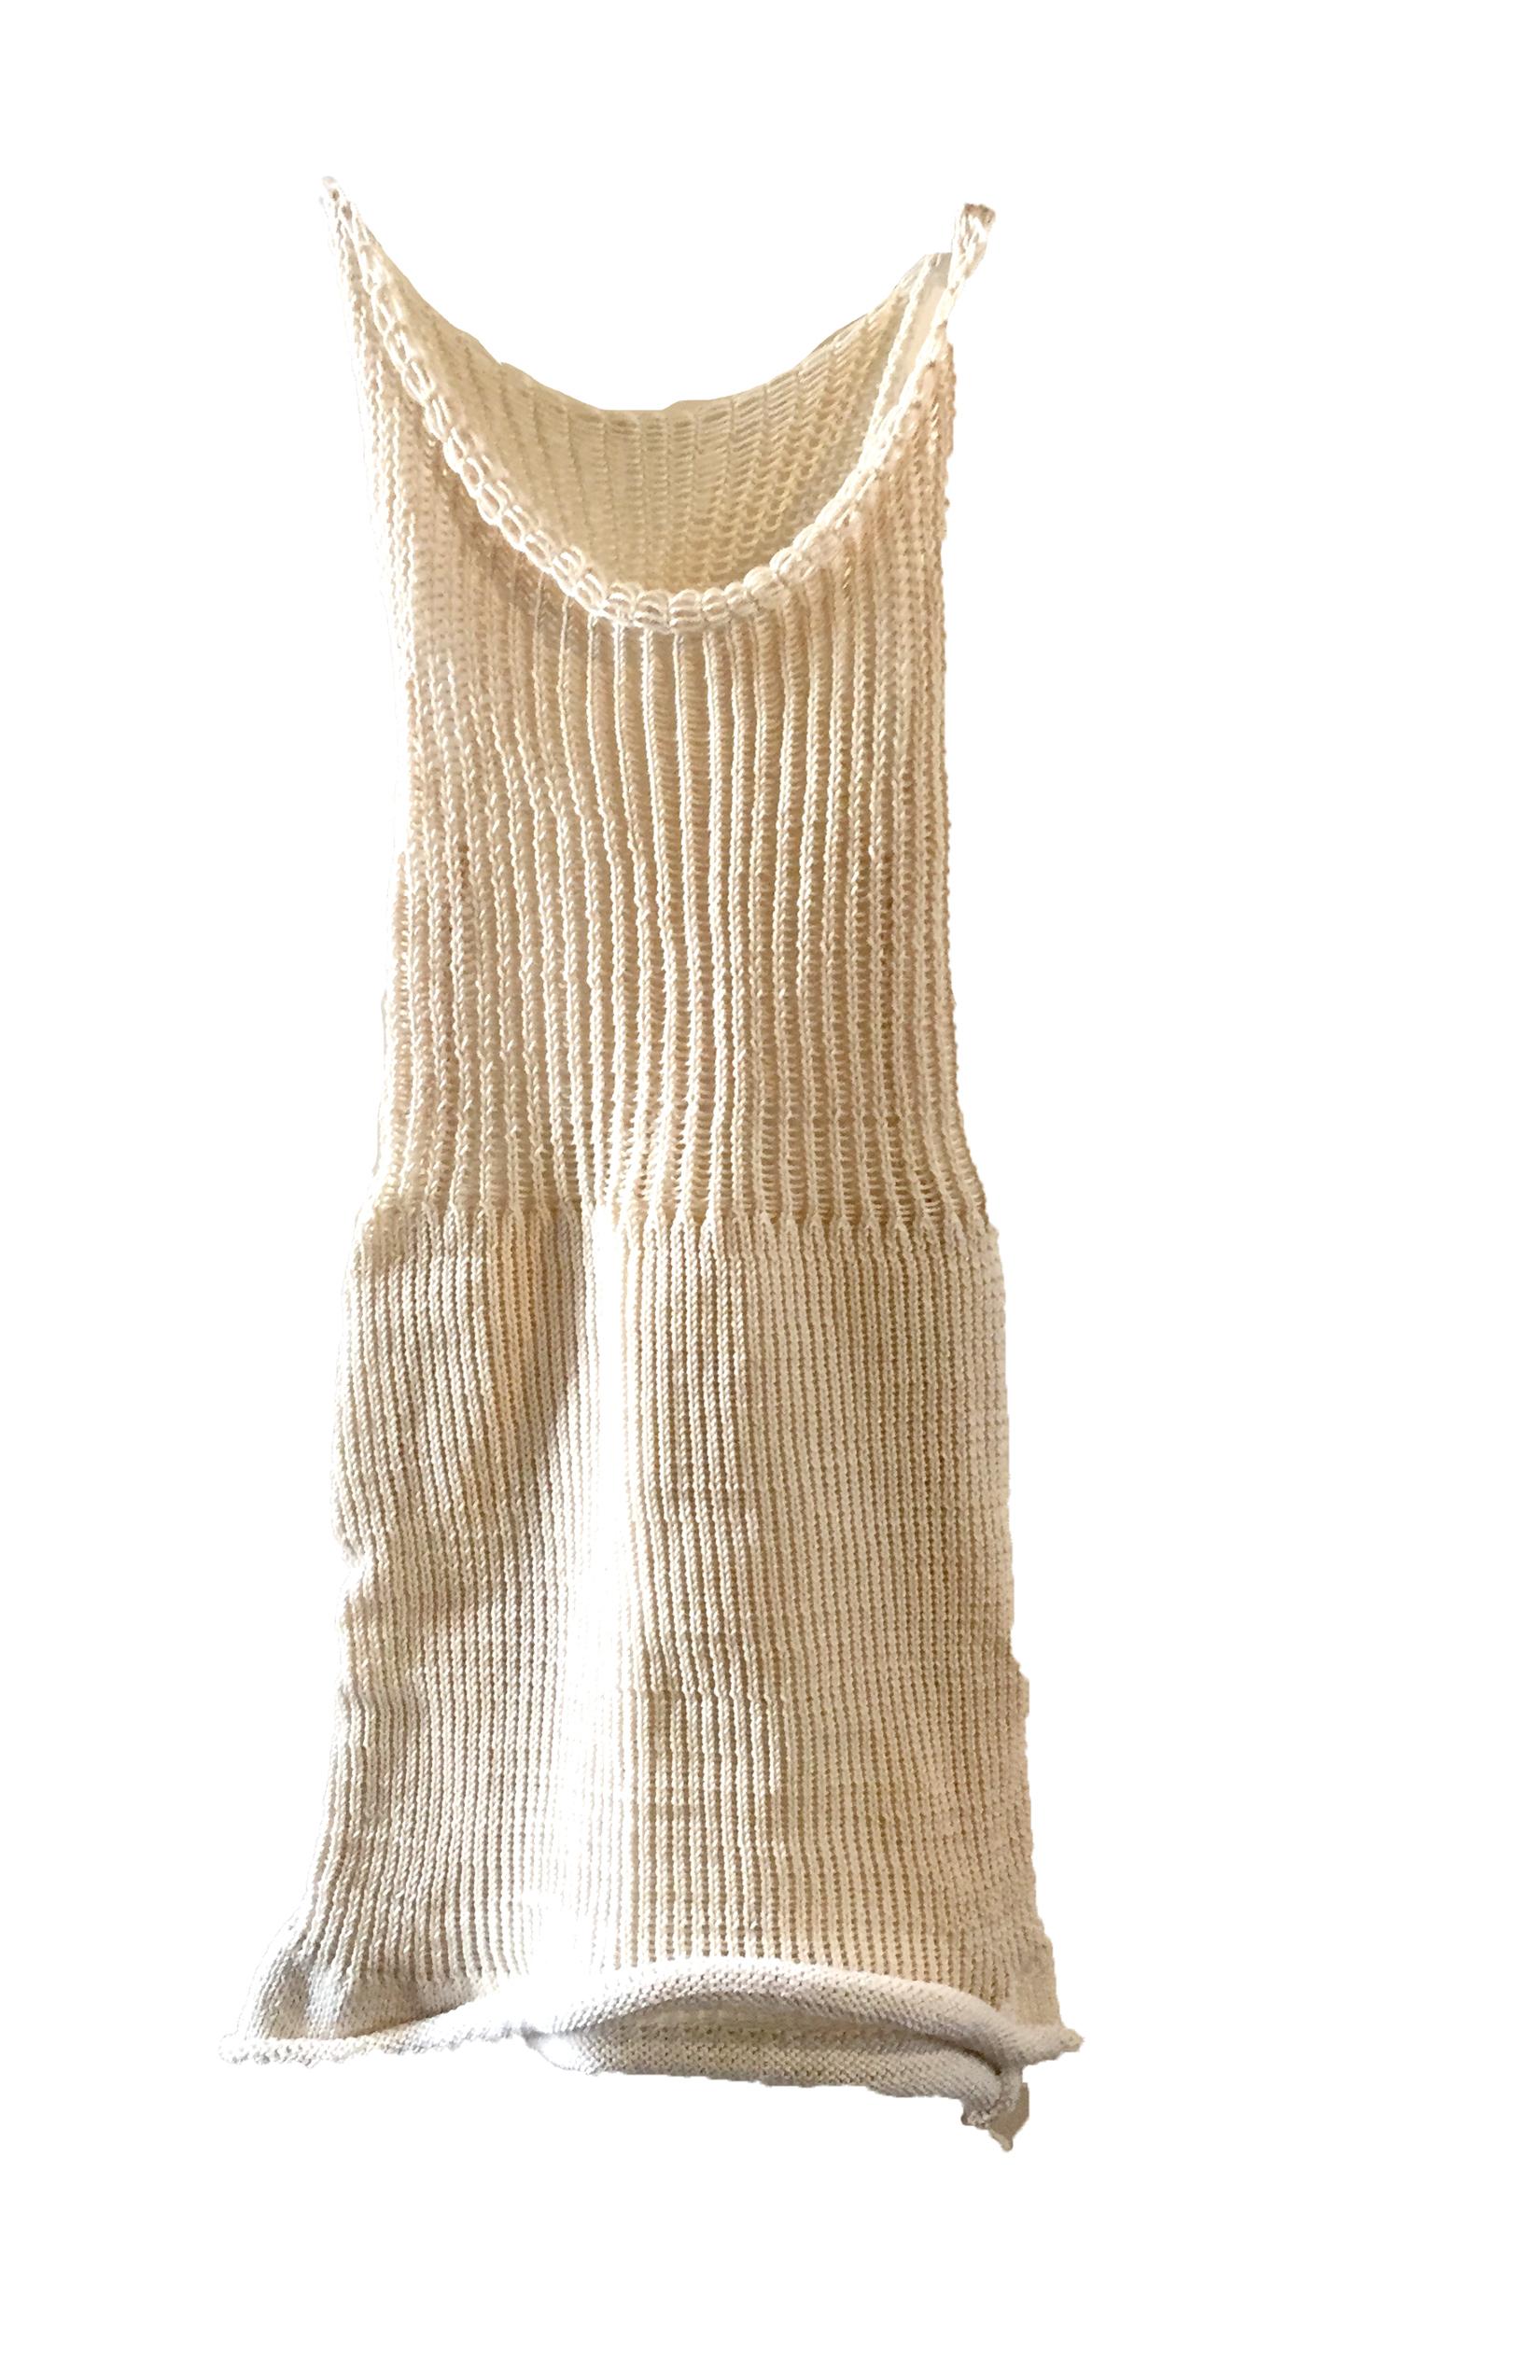 knit_top_and_shorts_DRAFTS6.jpg